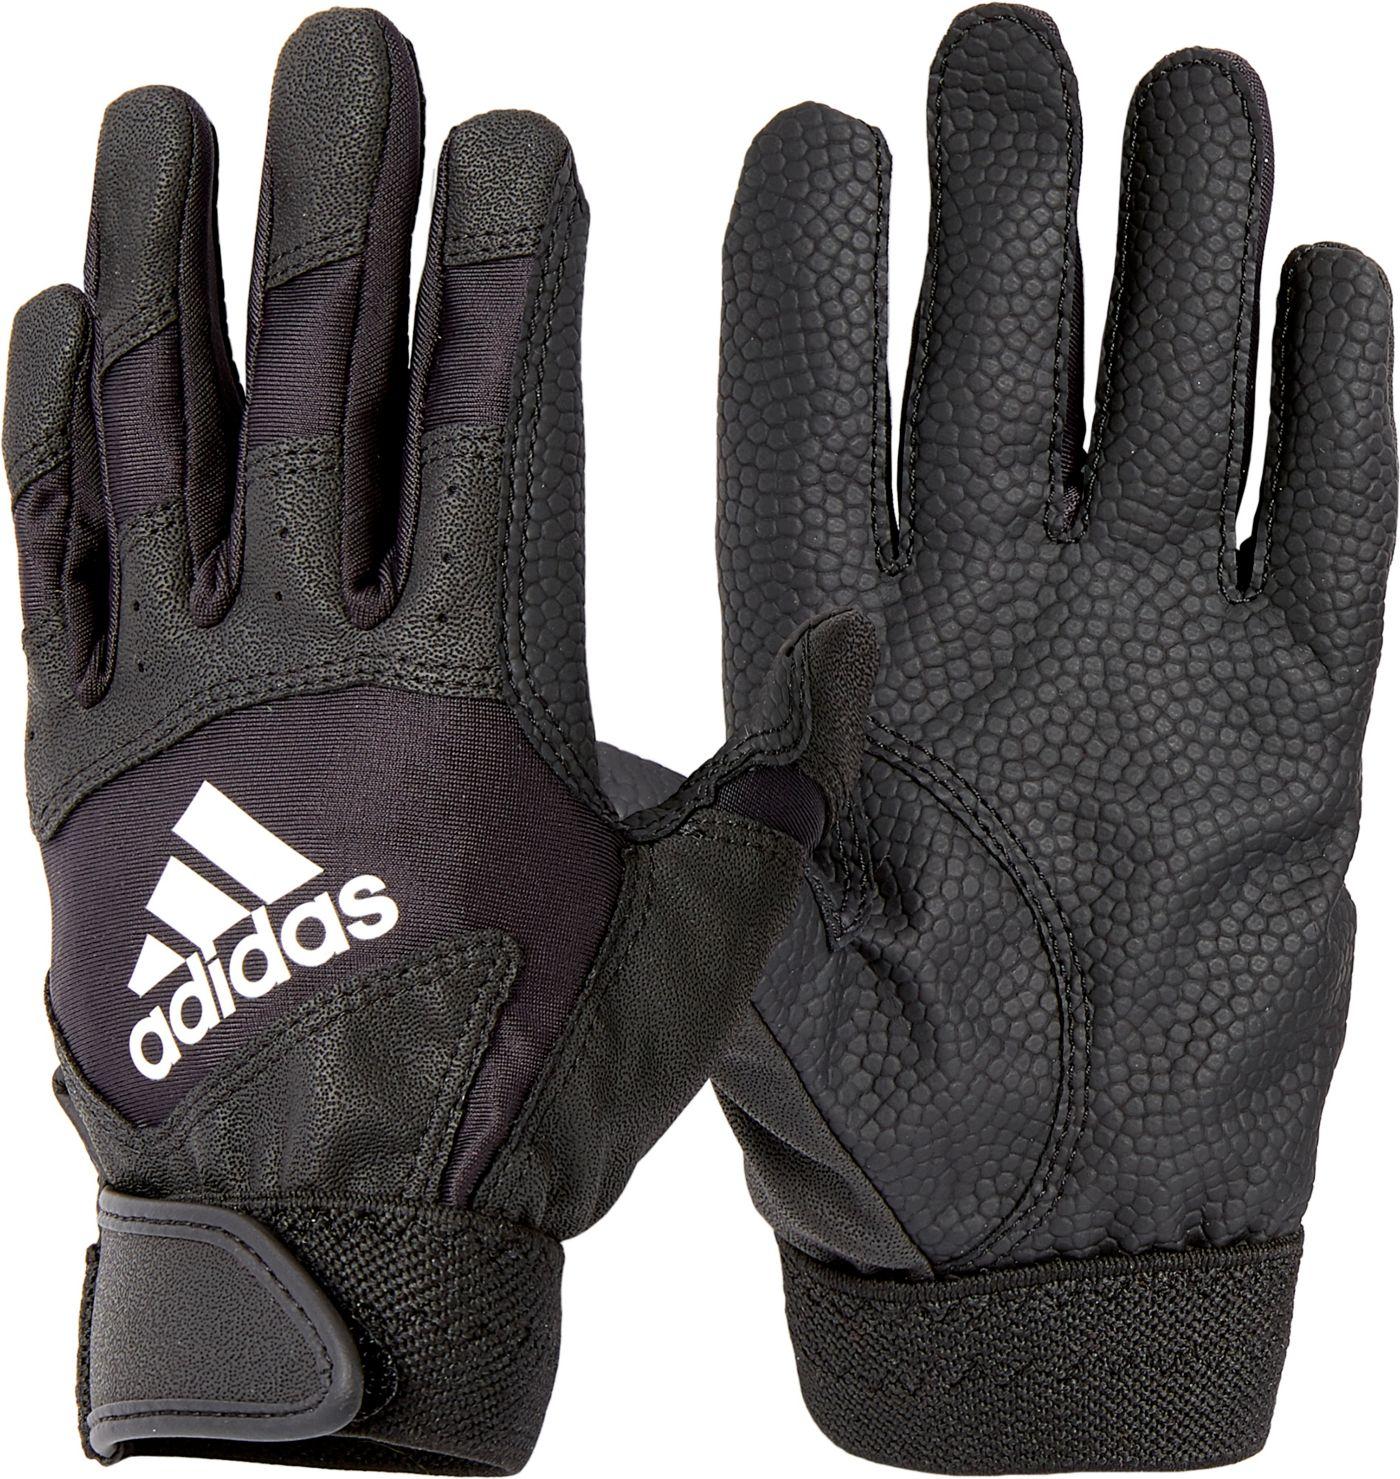 adidas T-Ball Batting Gloves